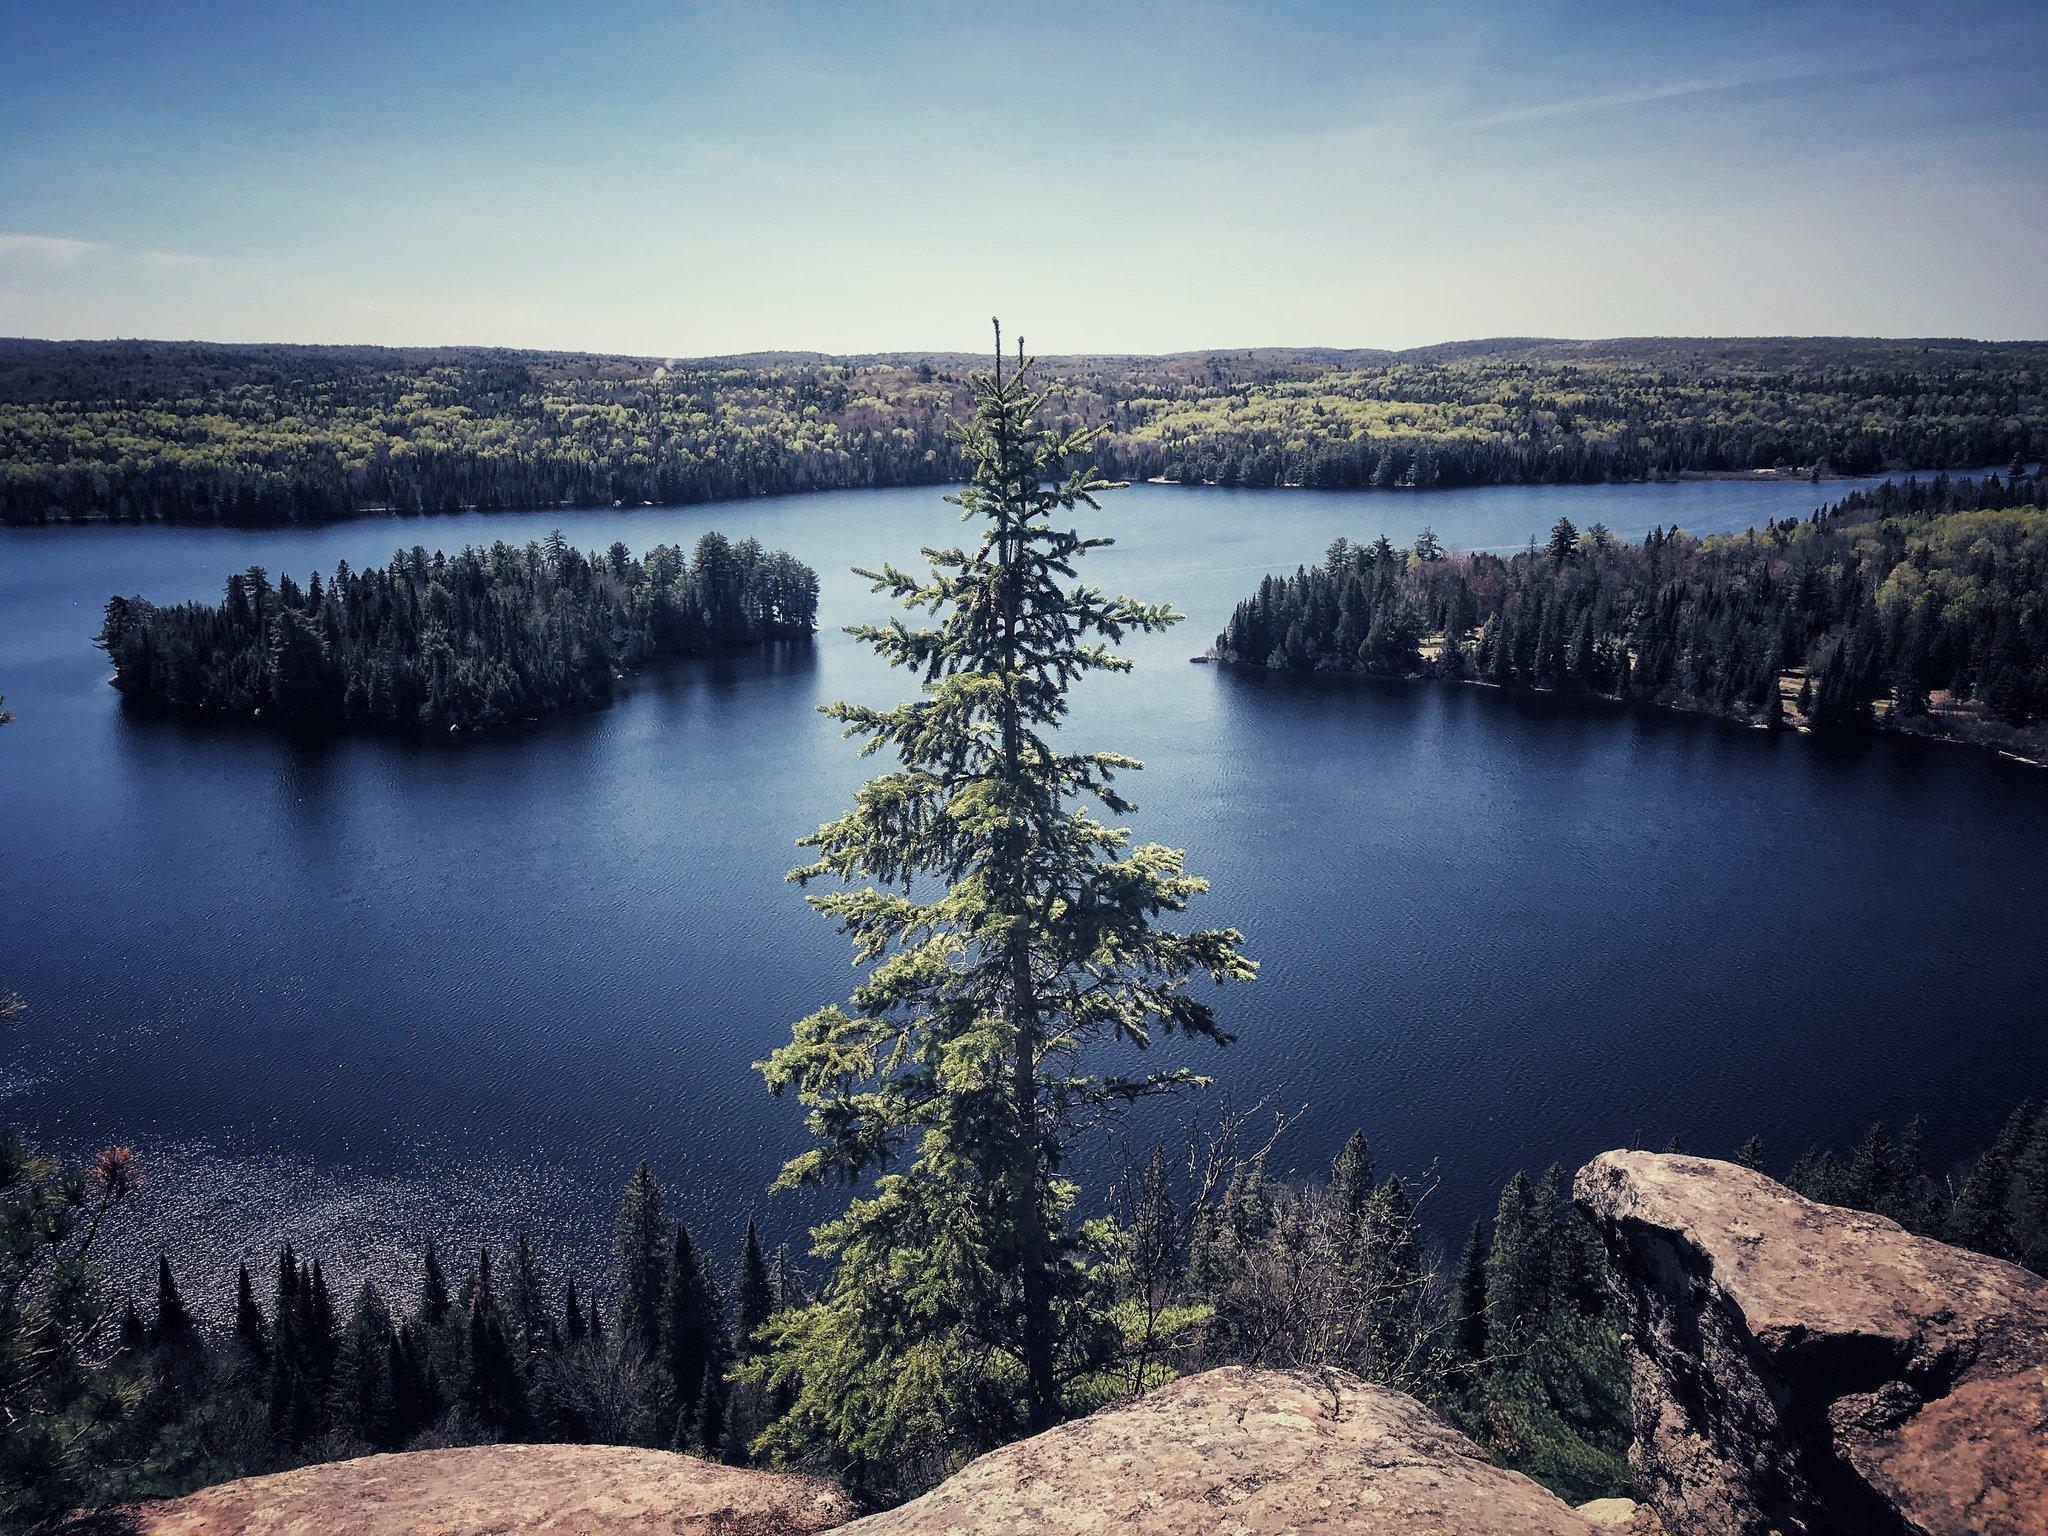 Scene from the Centennial Trail in Algonquin Park, Canada